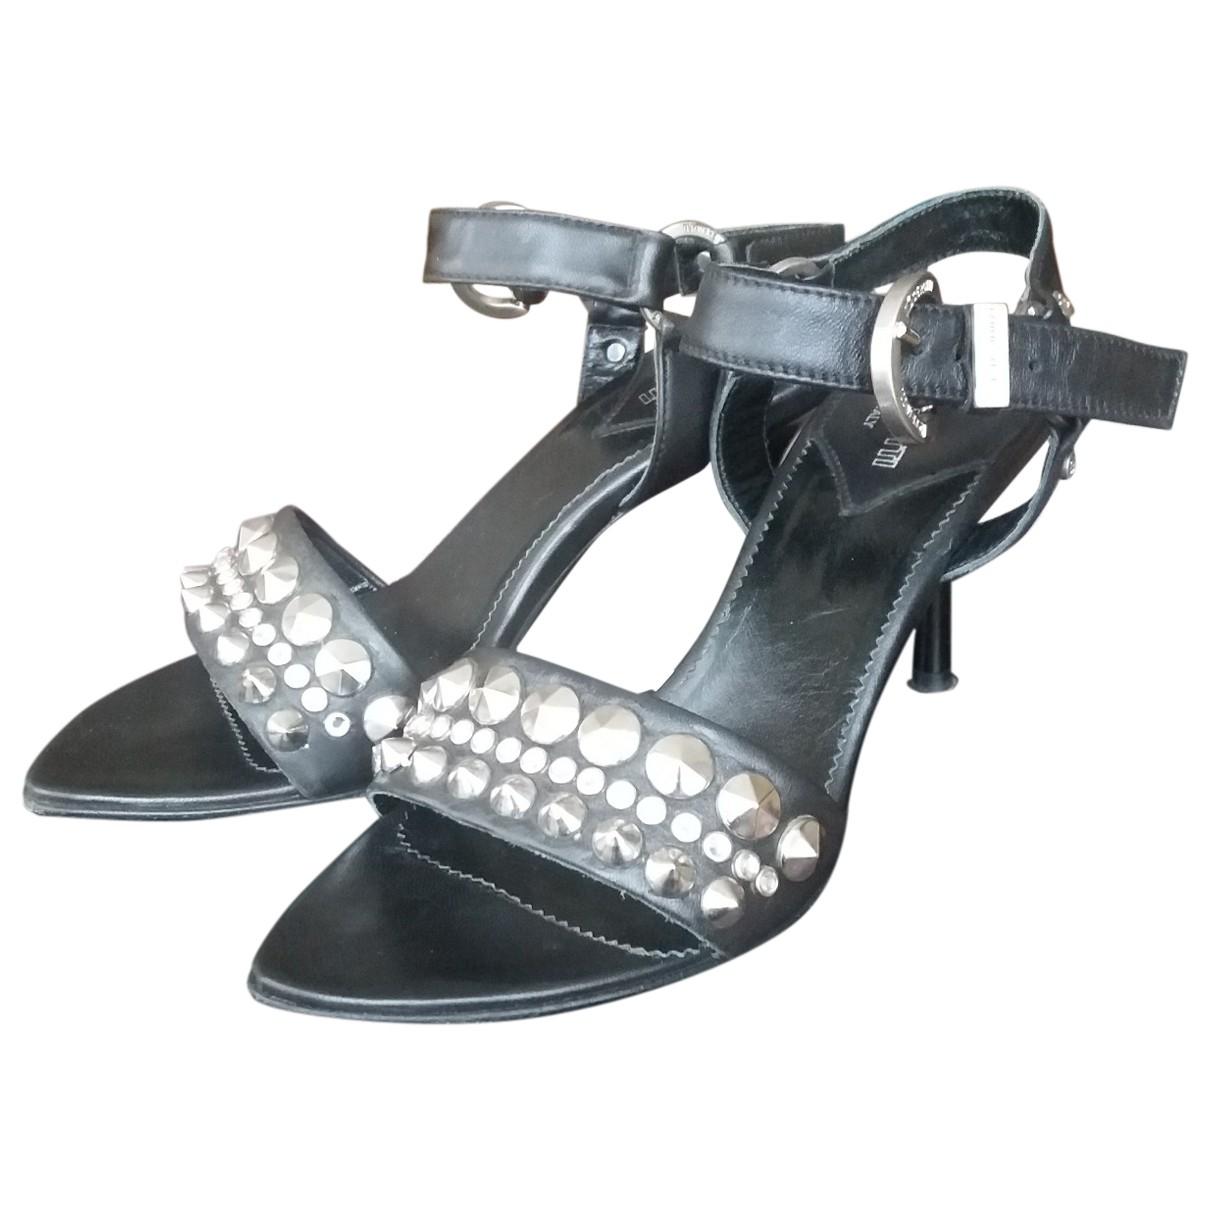 Cerruti \N Black Leather Sandals for Women 36 EU